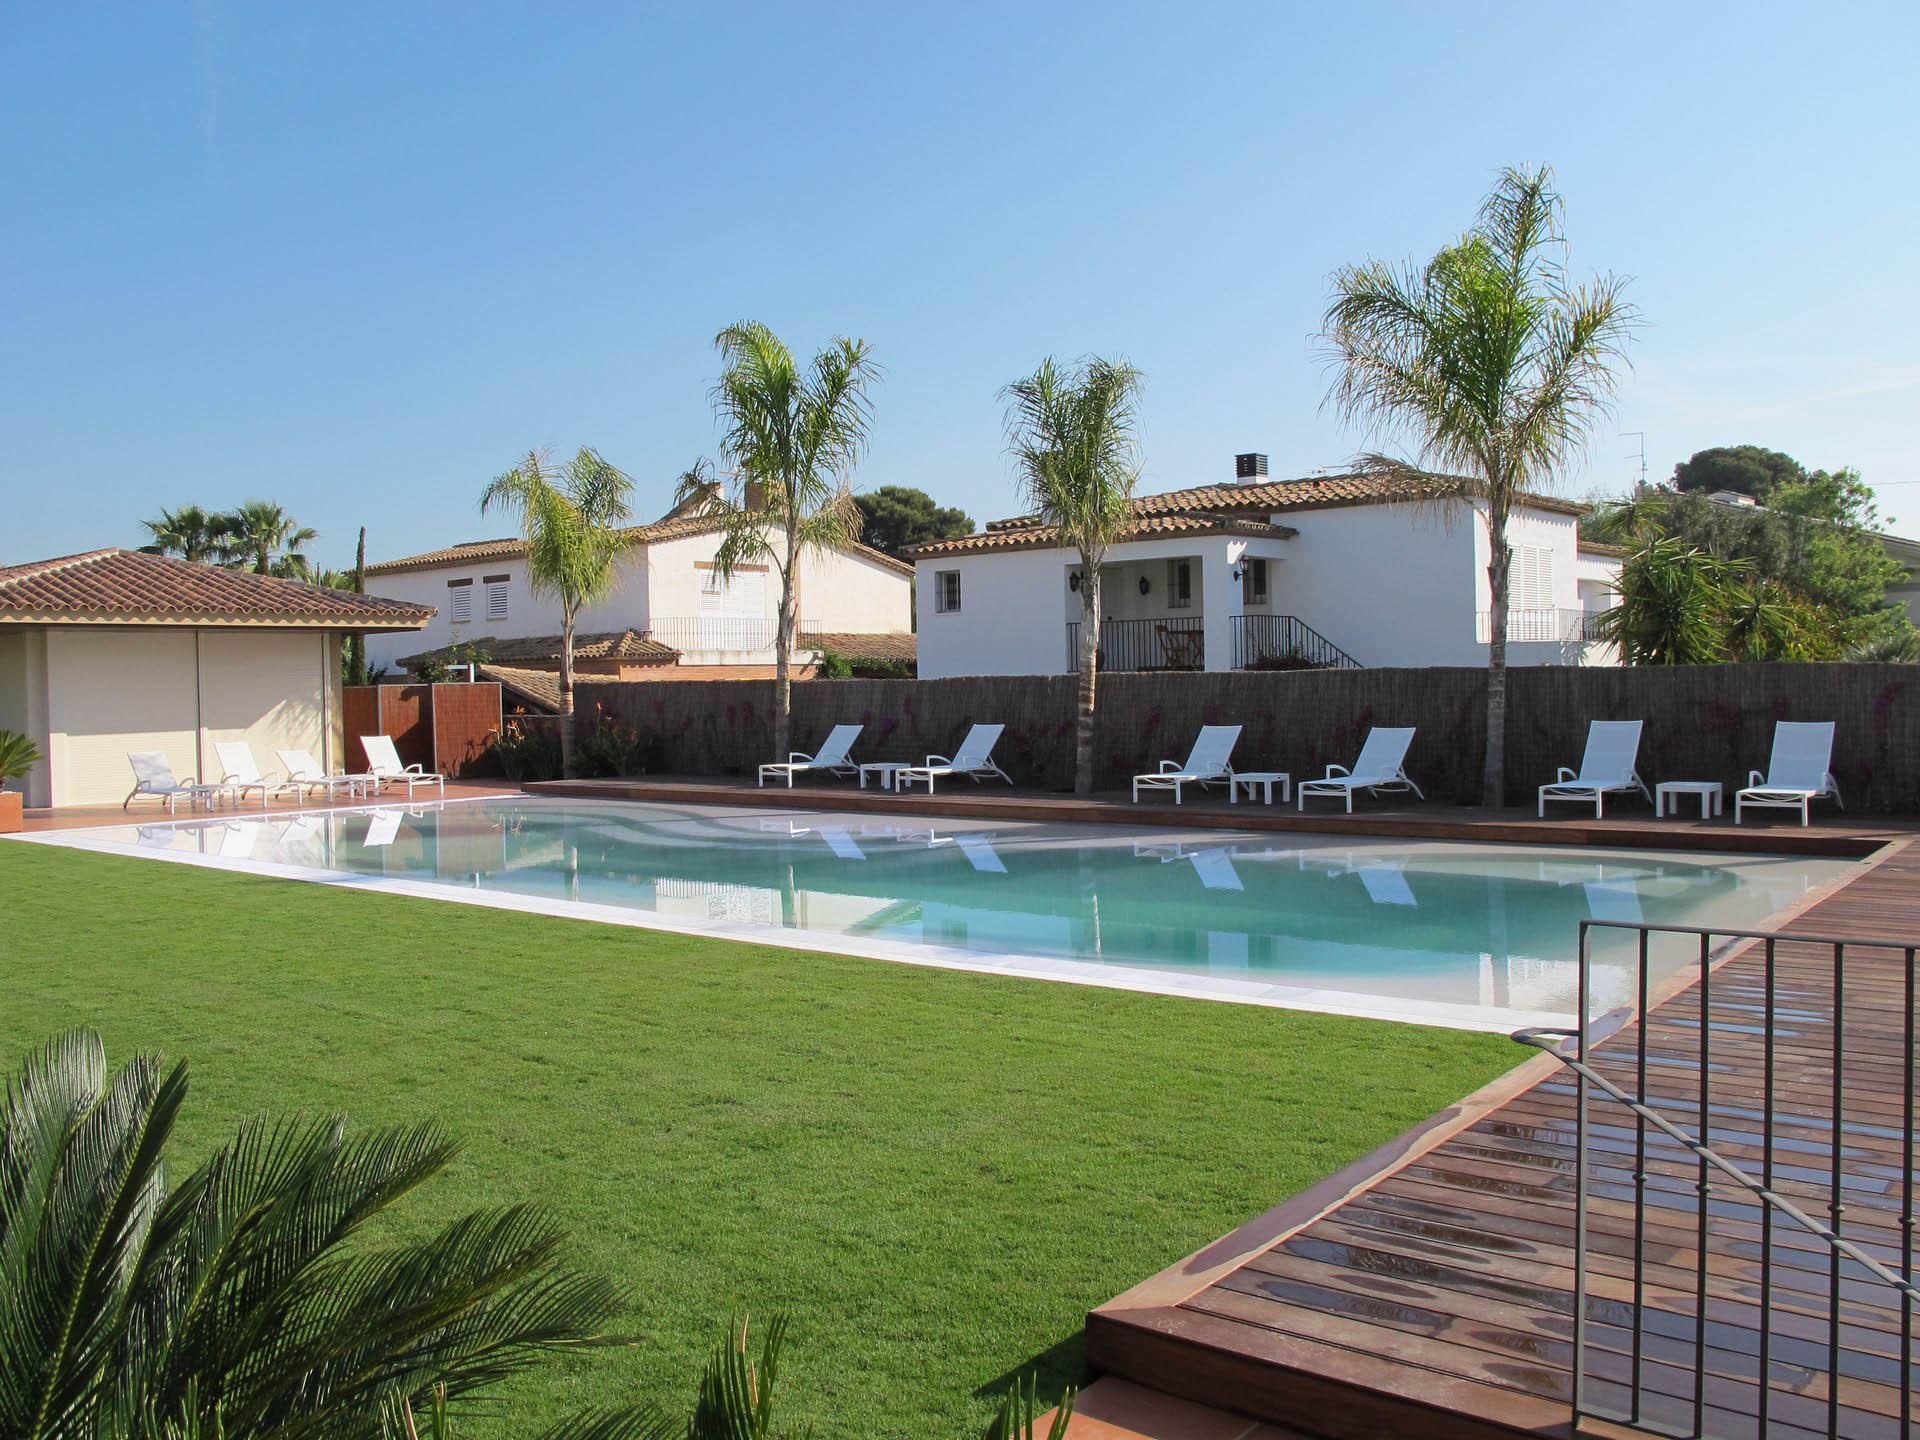 piscina-naturale-biodesign-004-1